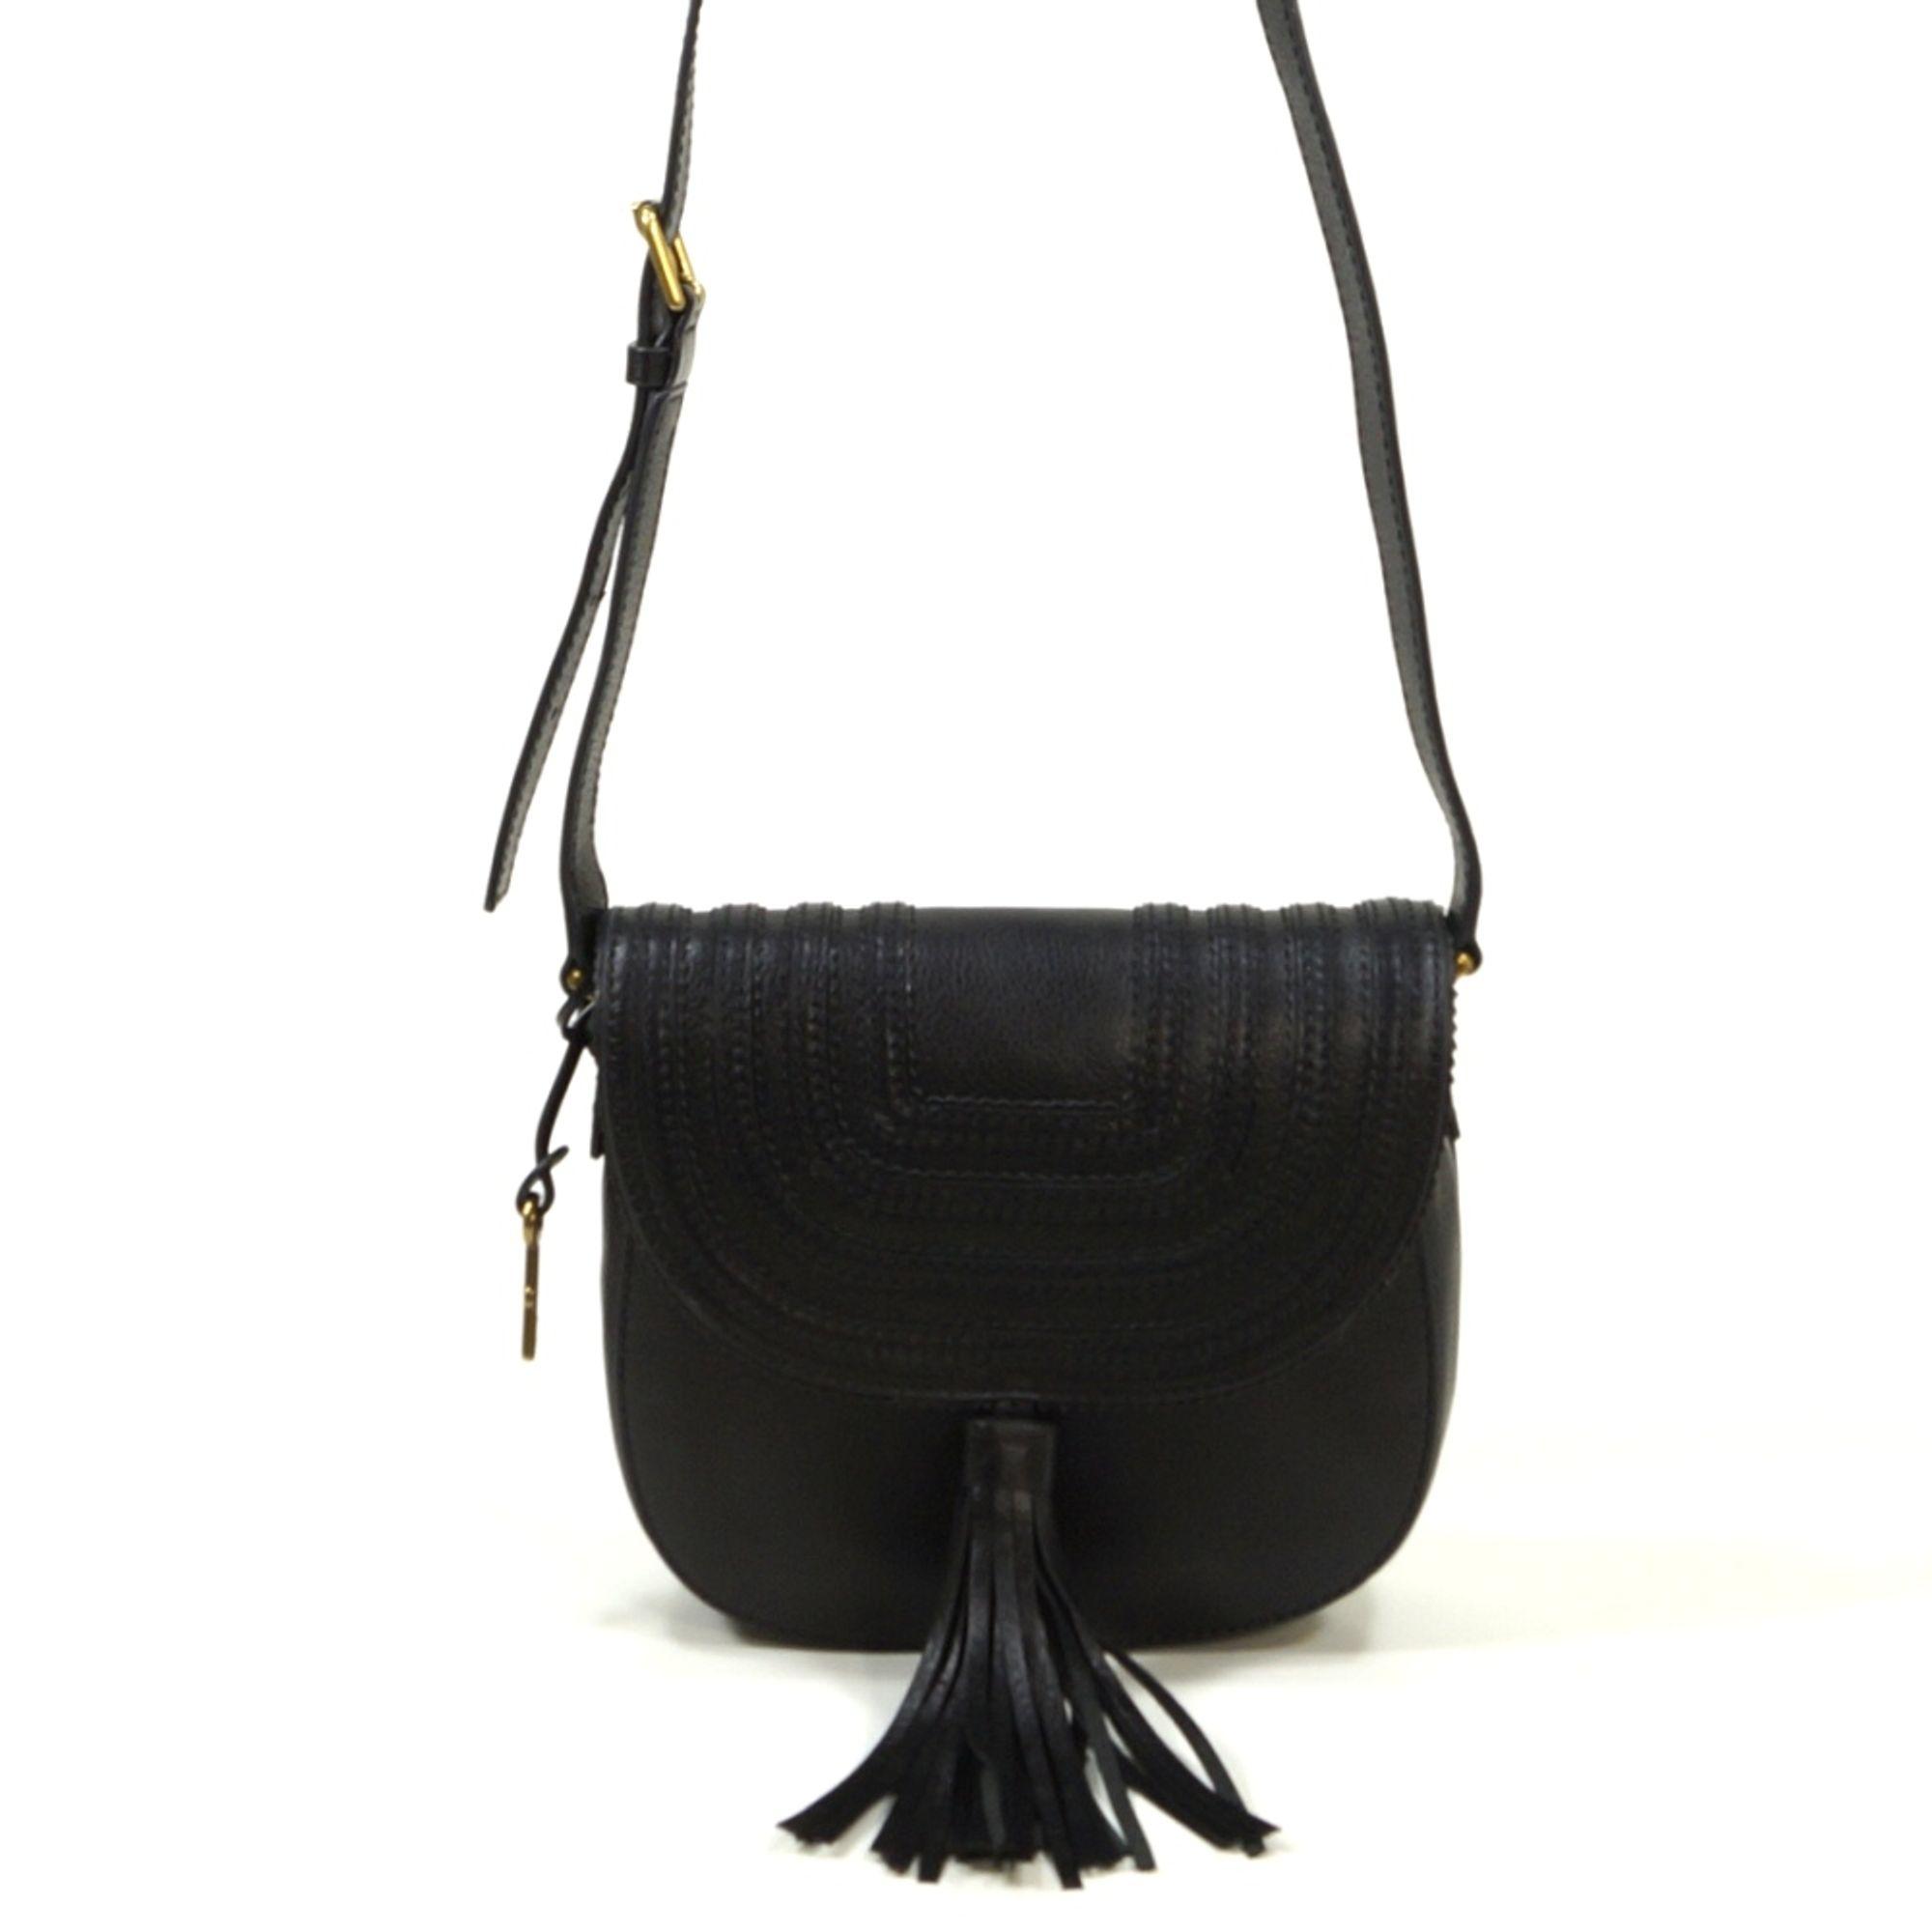 Emi Saddle Bag Schwarz ZB6849-001 Handtasche Tasche Leder